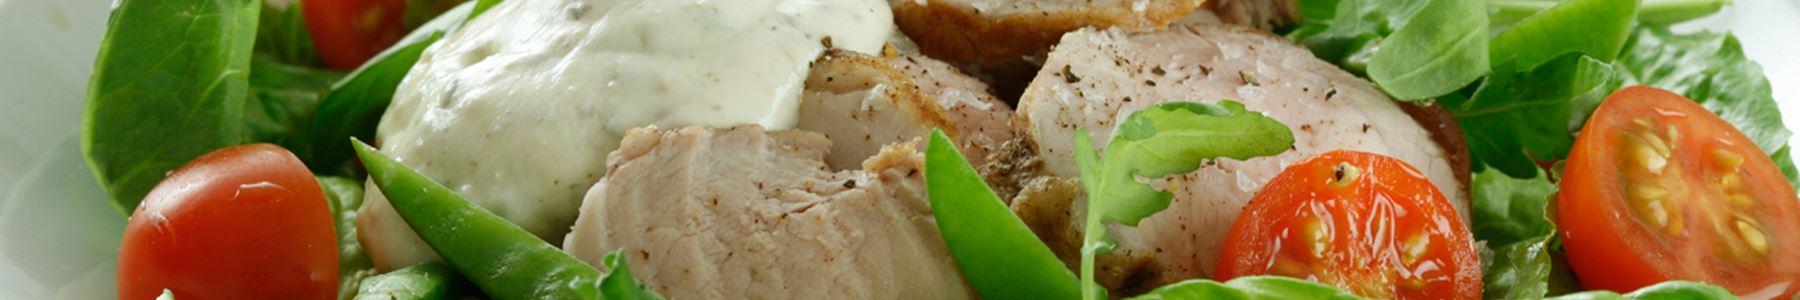 Kalorisnål + Bönor + Romansallad + Lunch